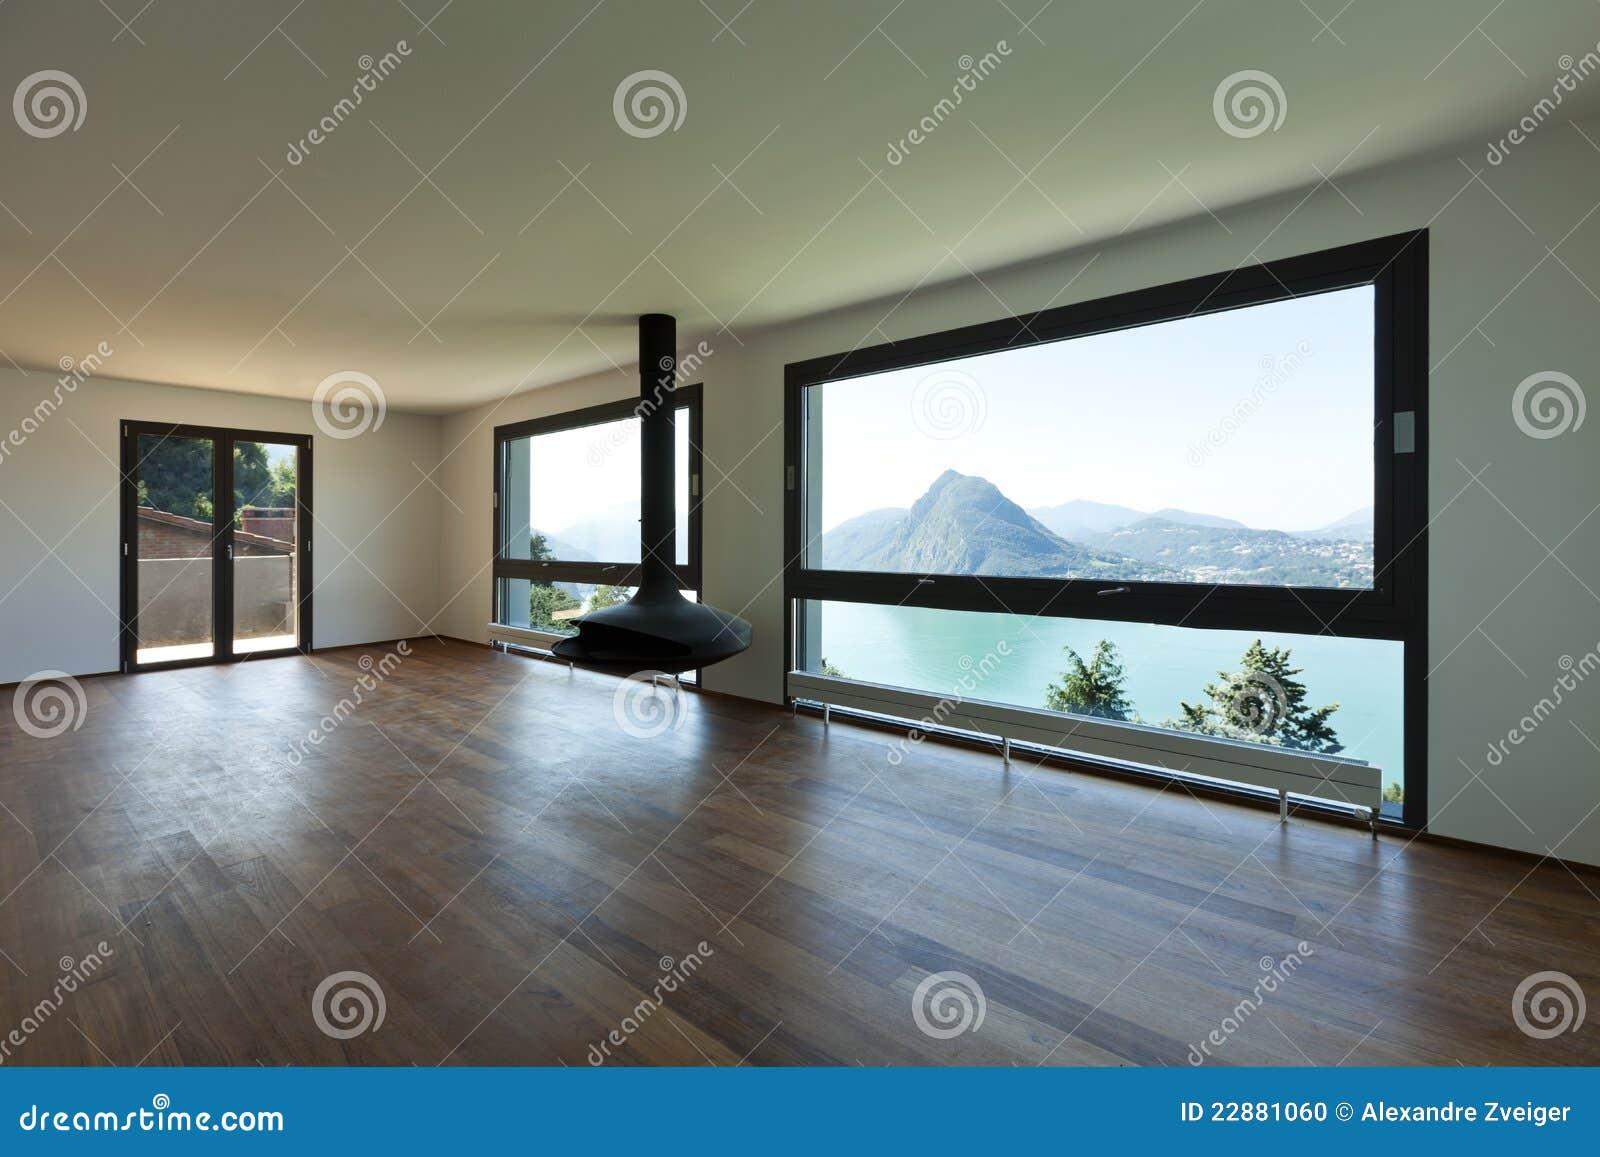 emejing gro es bild wohnzimmer pictures ideas design. Black Bedroom Furniture Sets. Home Design Ideas